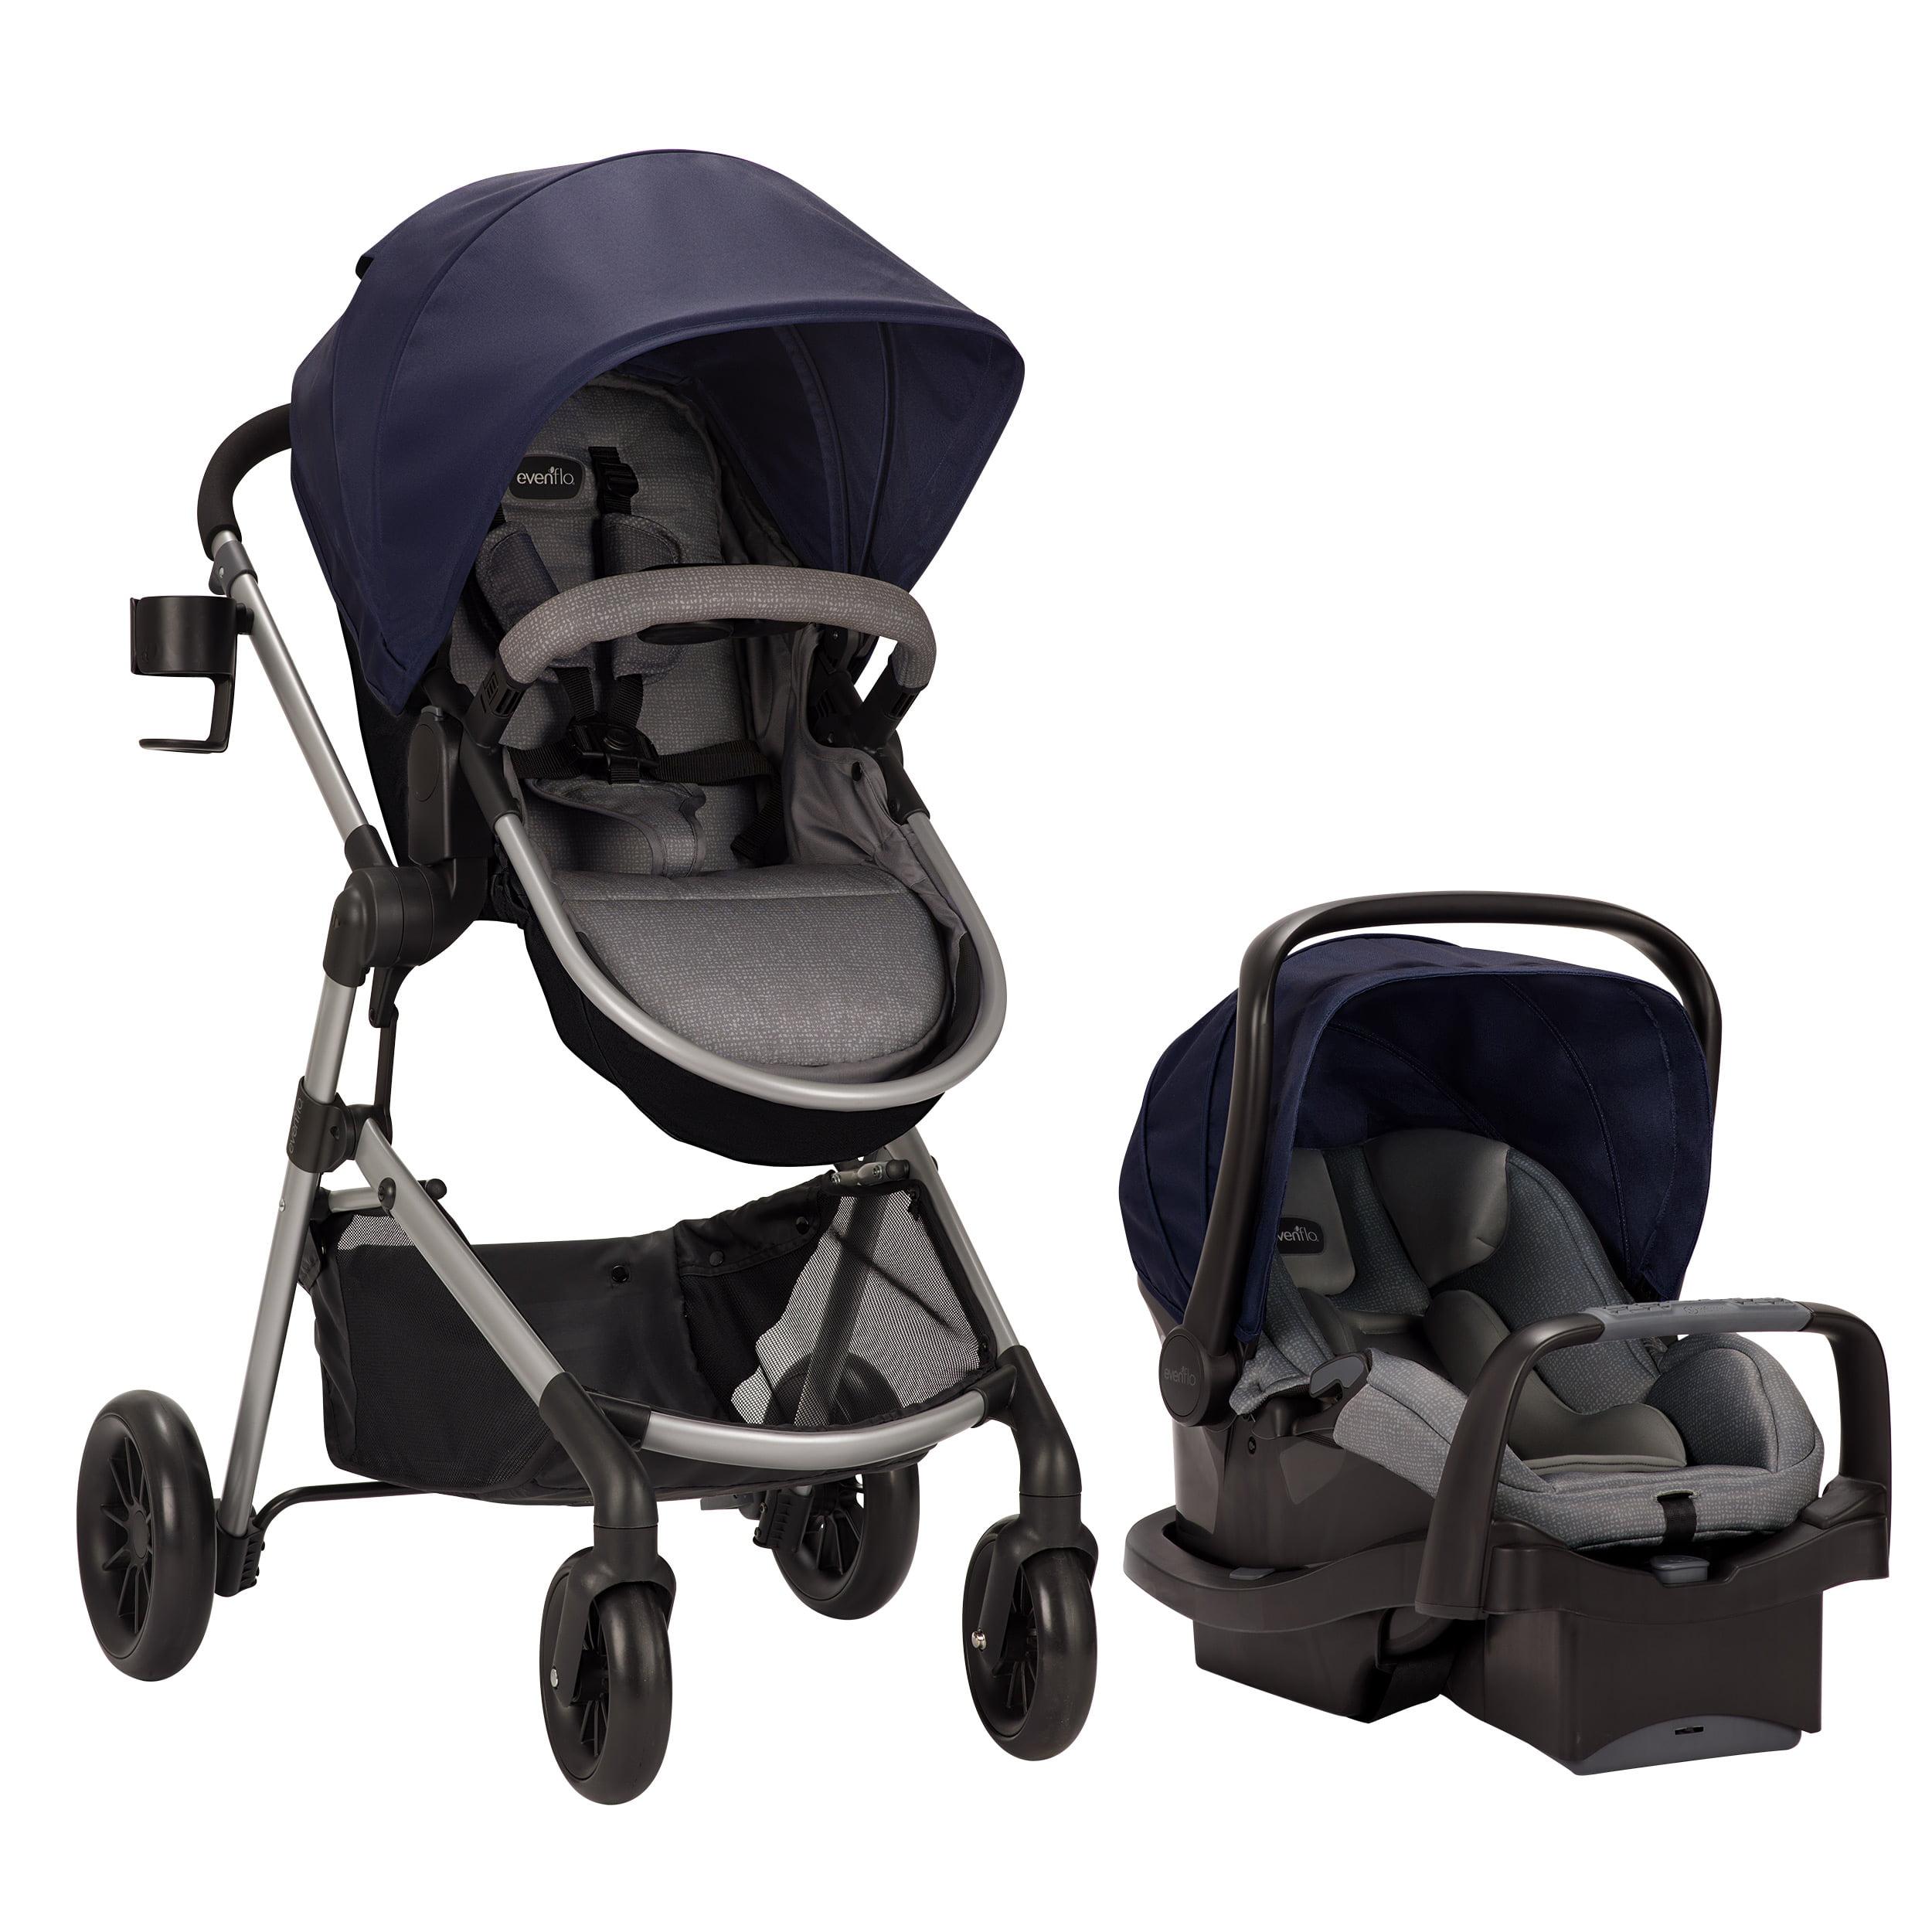 Evenflo Pivot Modular Travel System w/Safemax Infant Car Seat, Navy